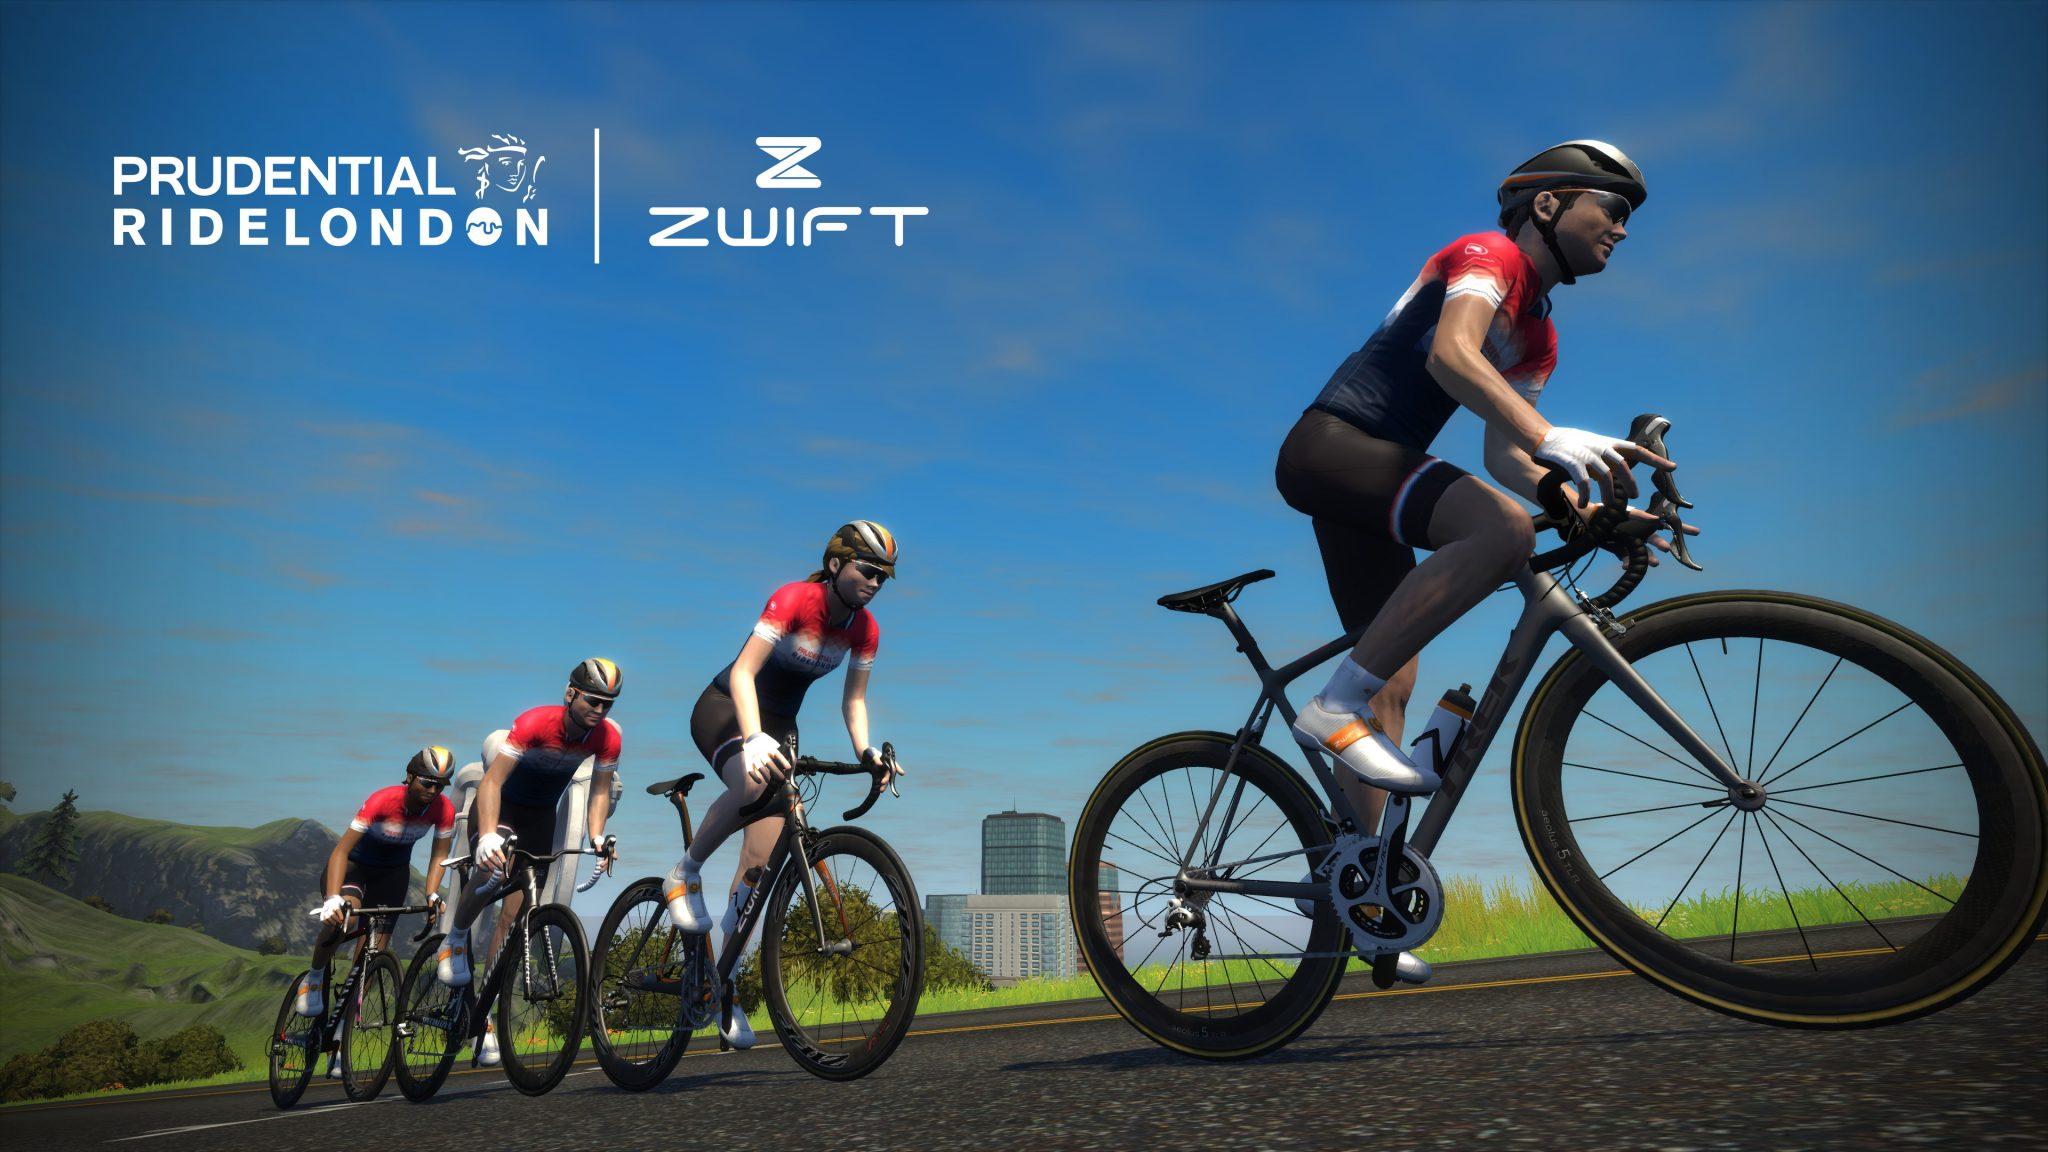 The Zwift Alternative - Prudential Ride London the5krunner